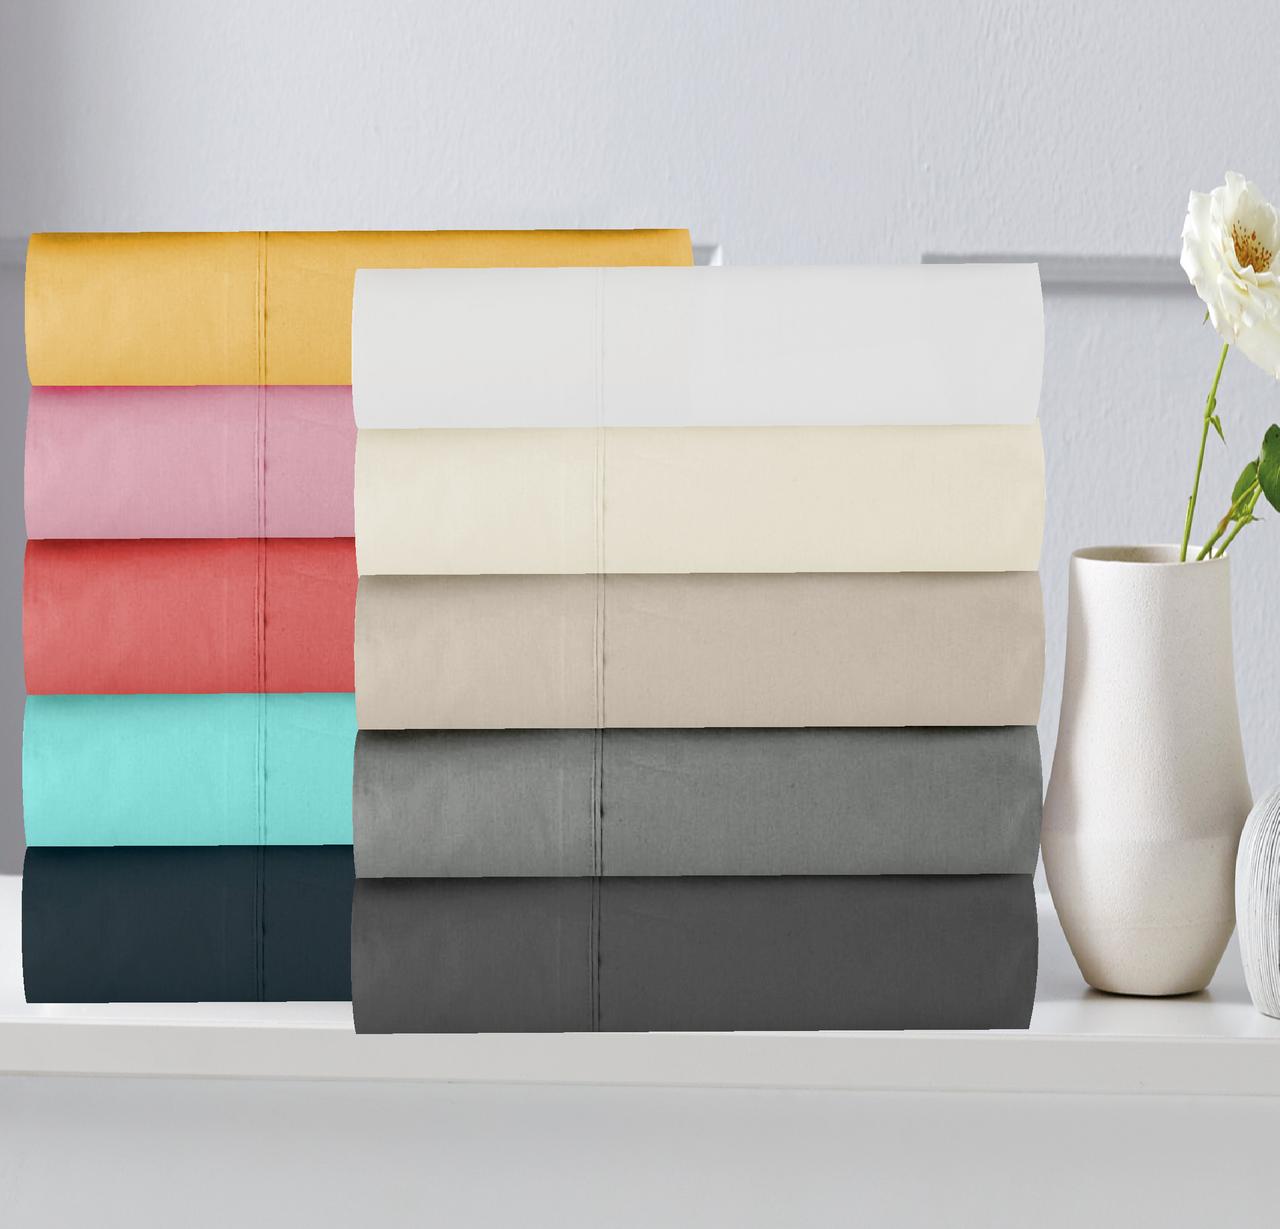 In2Linen /Harper Home European Pillowcases 300 T/C Cotton Percale  | Assorted colours